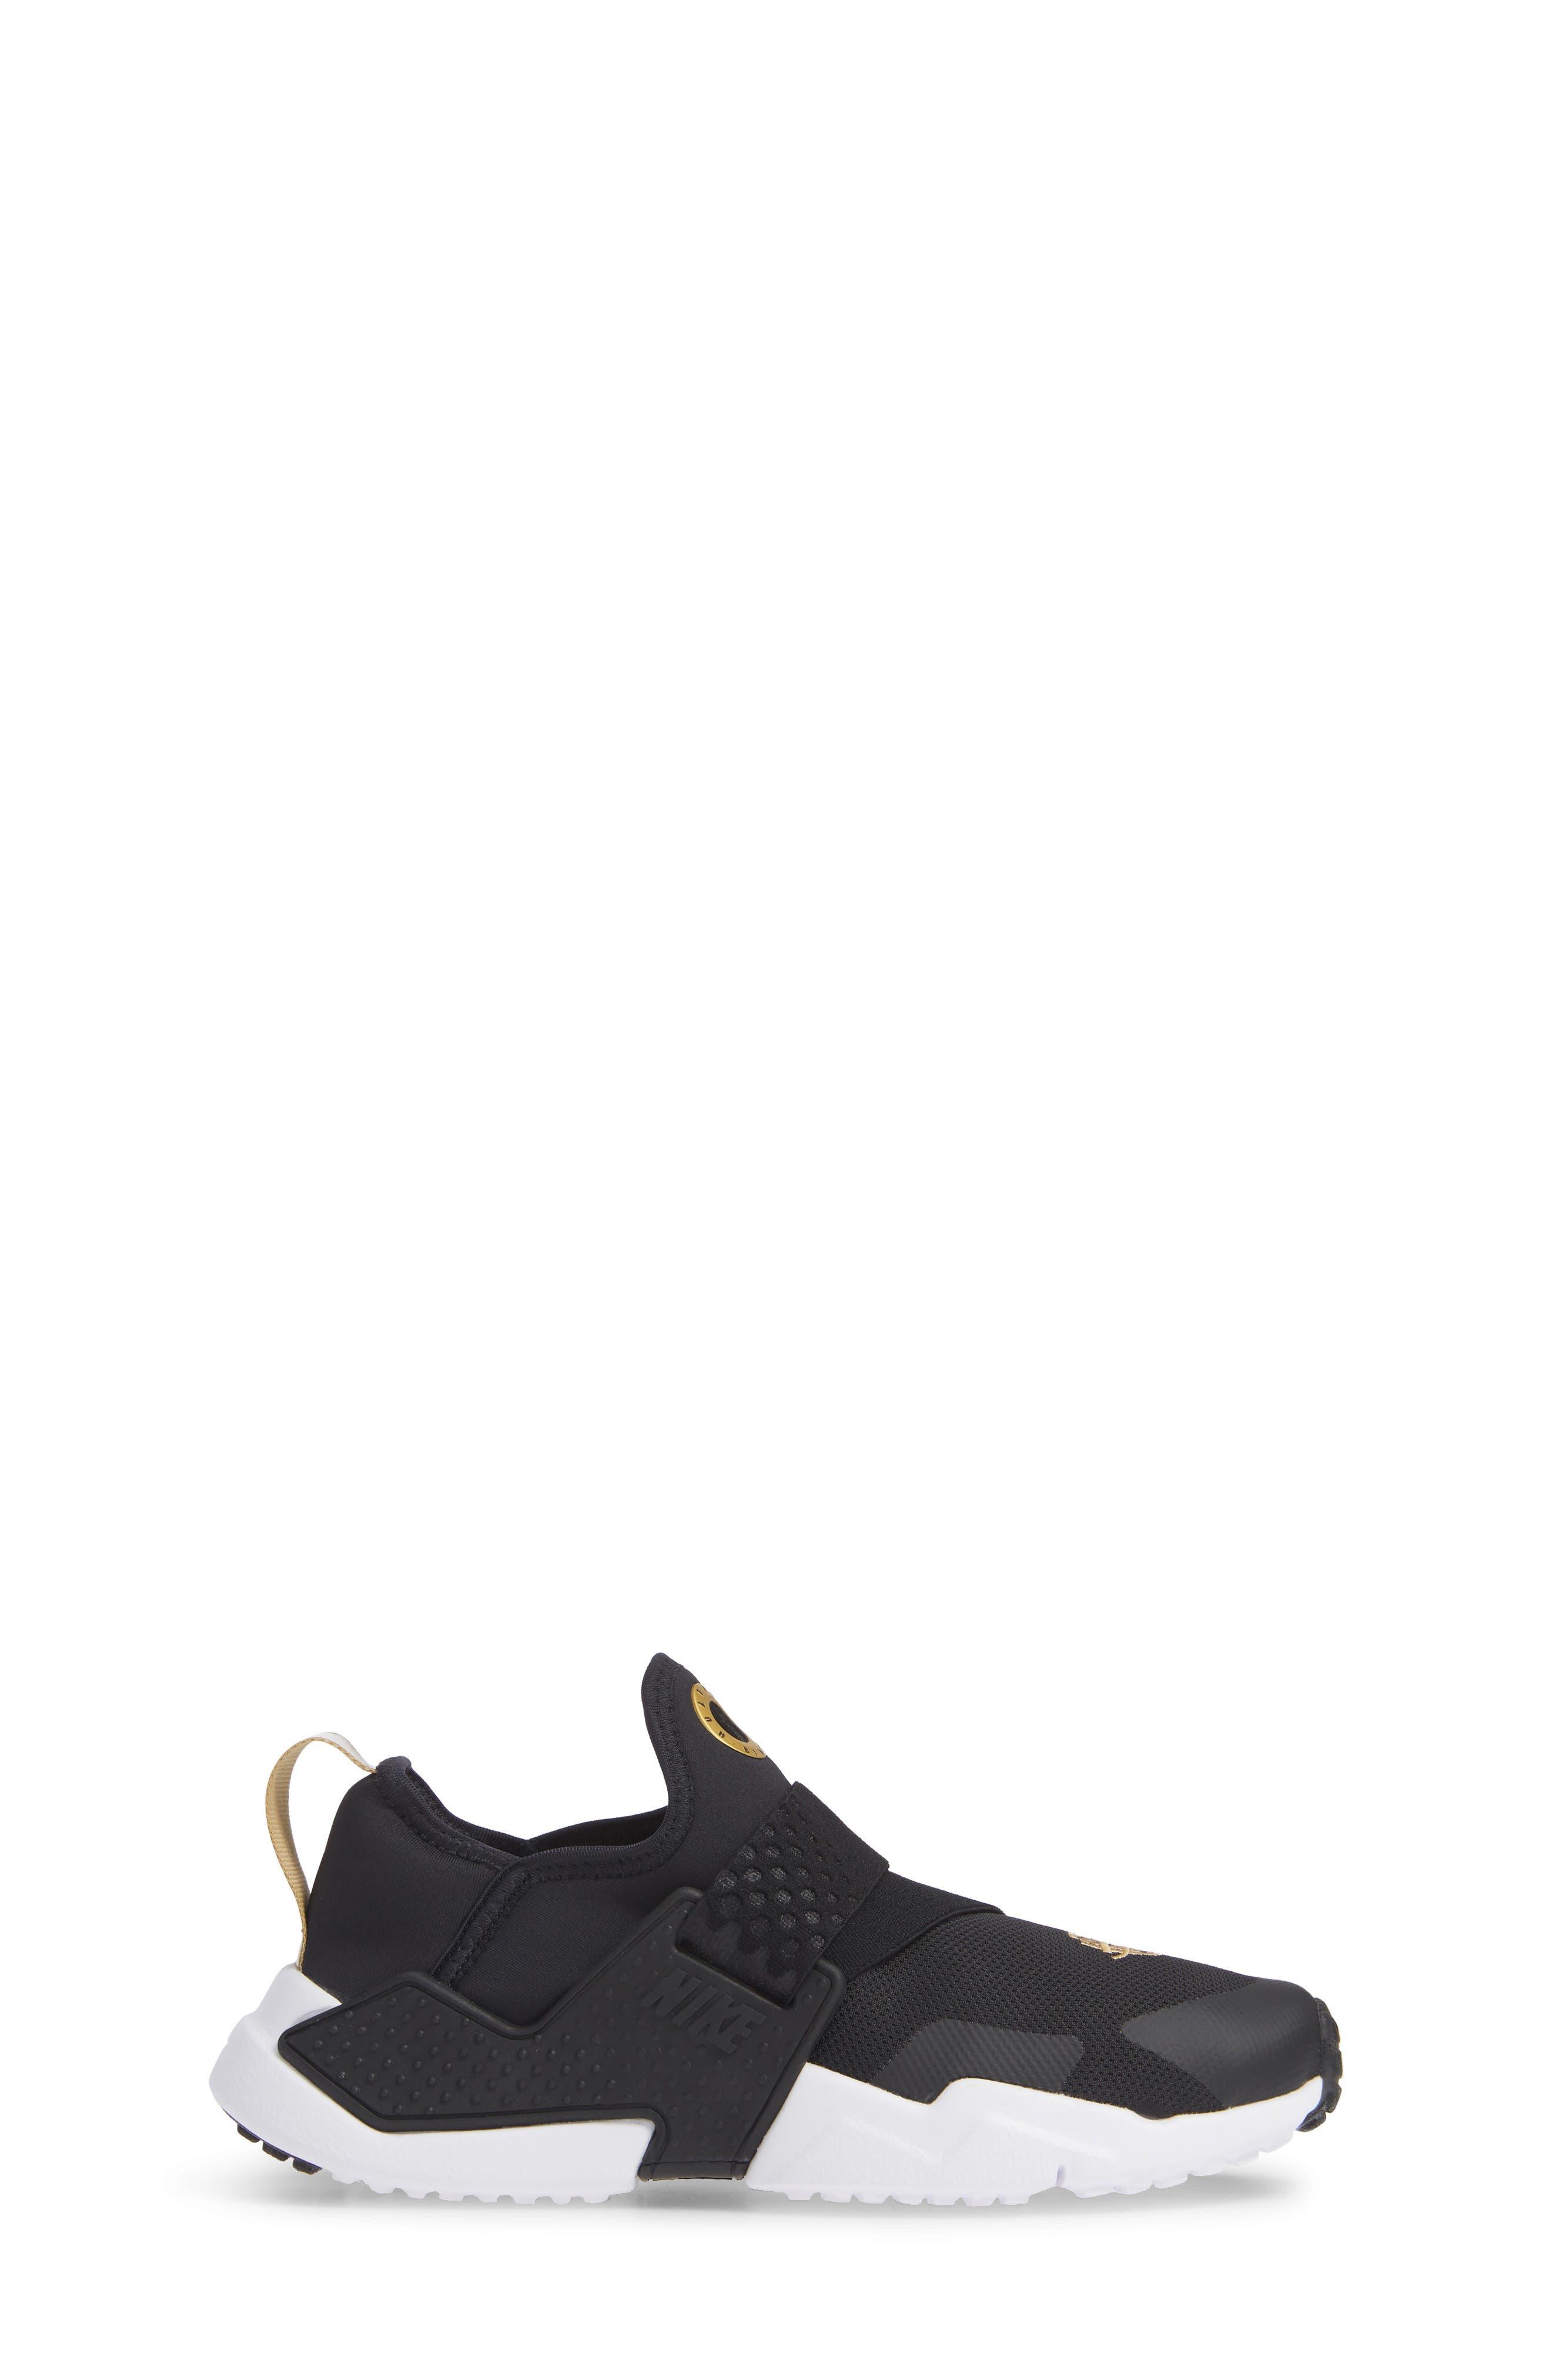 Huarache Extreme Sneaker,                             Alternate thumbnail 3, color,                             BLACK/ METALLIC GOLD/ WHITE